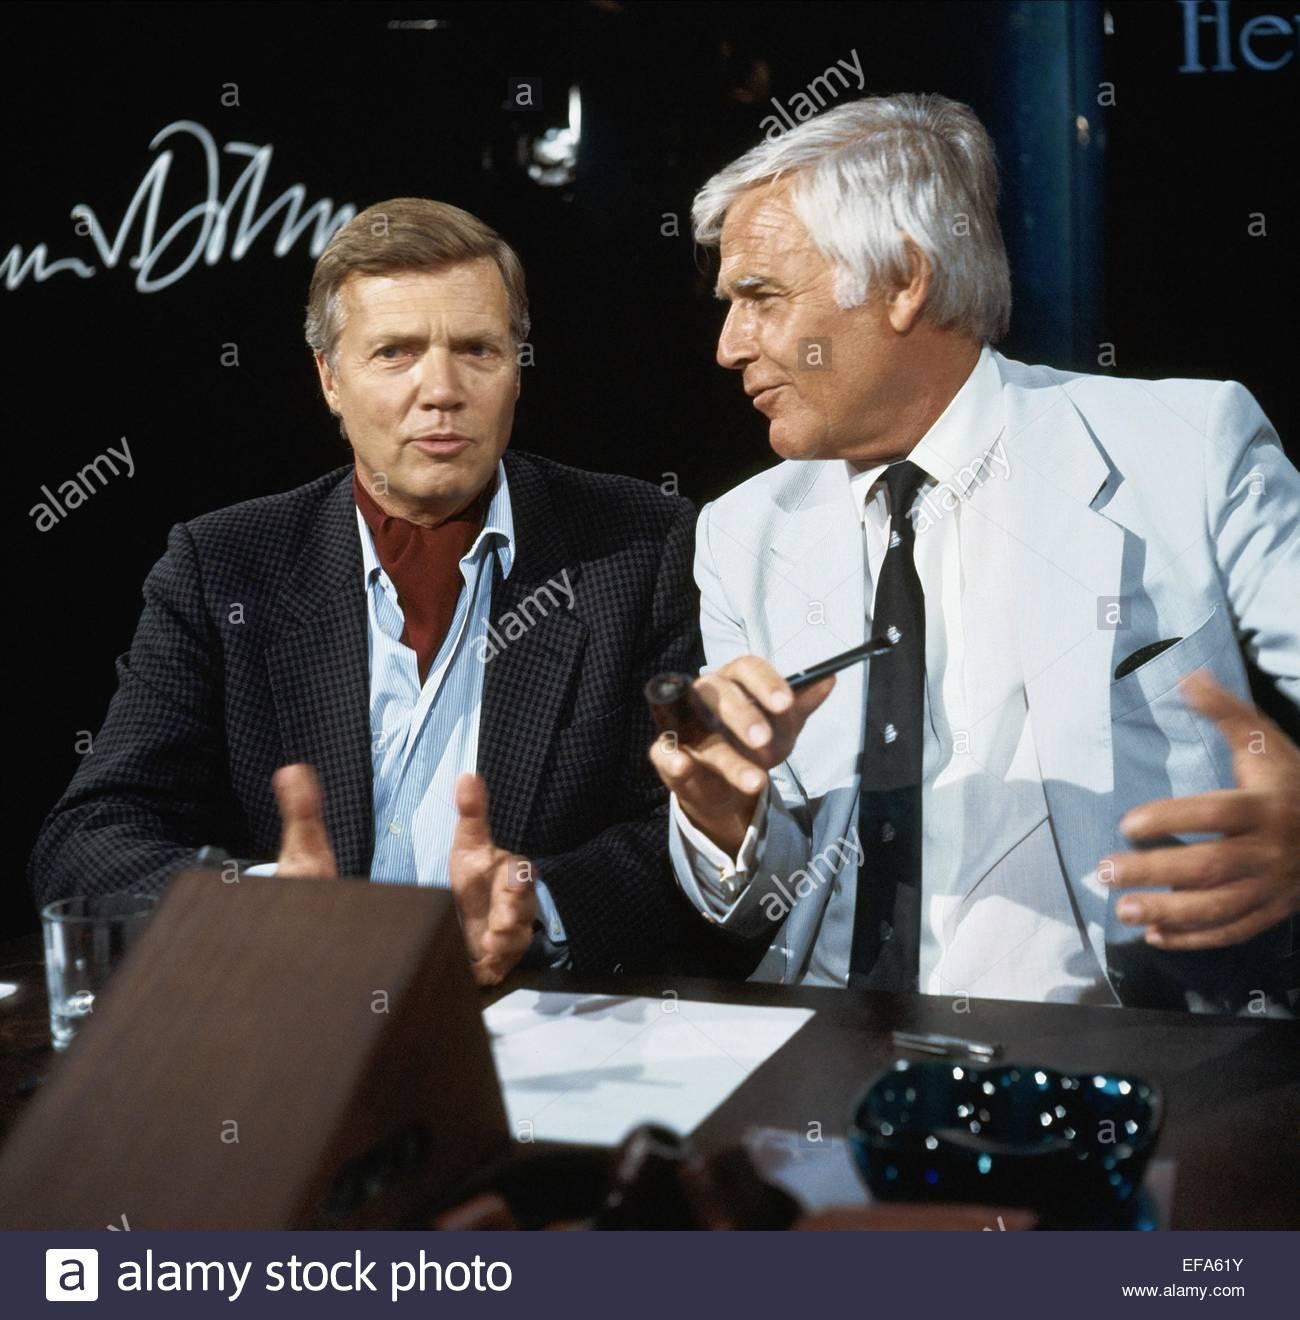 KARLHEINZ BÖHM & JOACHIM FUCHSBERGER attore (1983) Immagini Stock